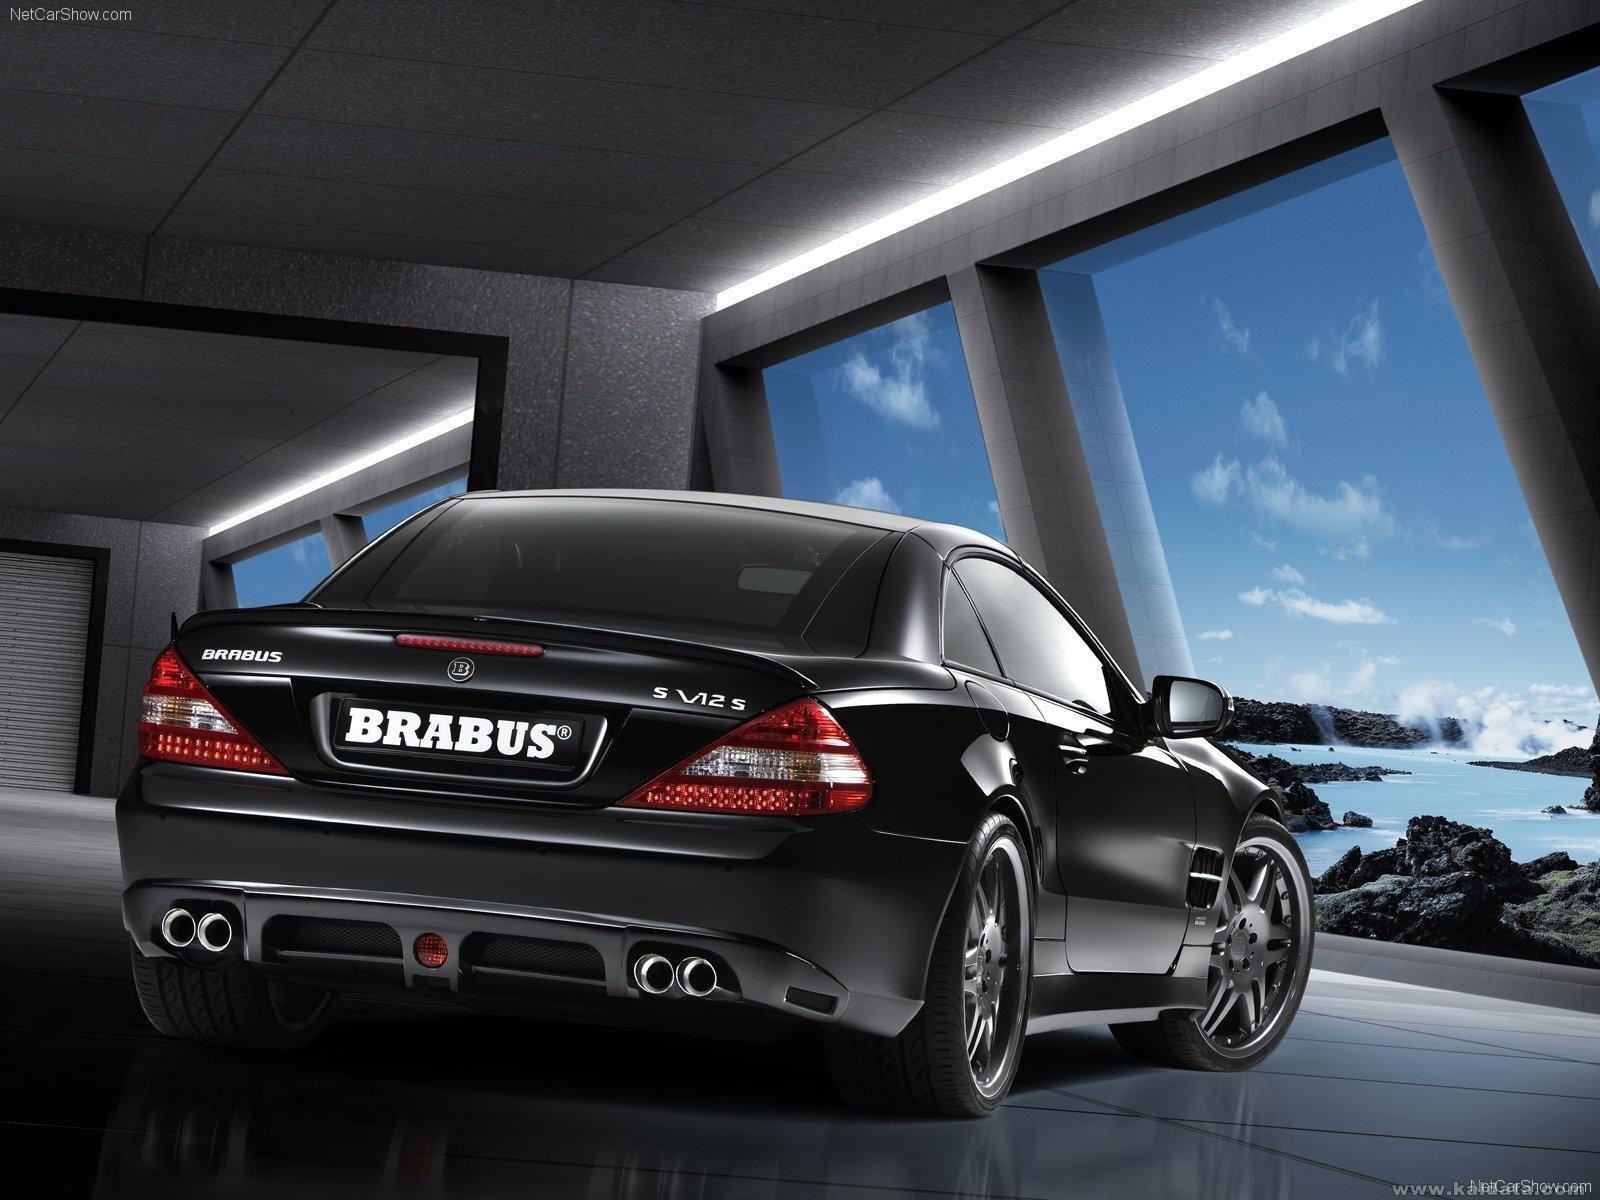 Brabus-Mercedes-Benz_SL-Class_2009_1600x1200_wallpaper_02.jp